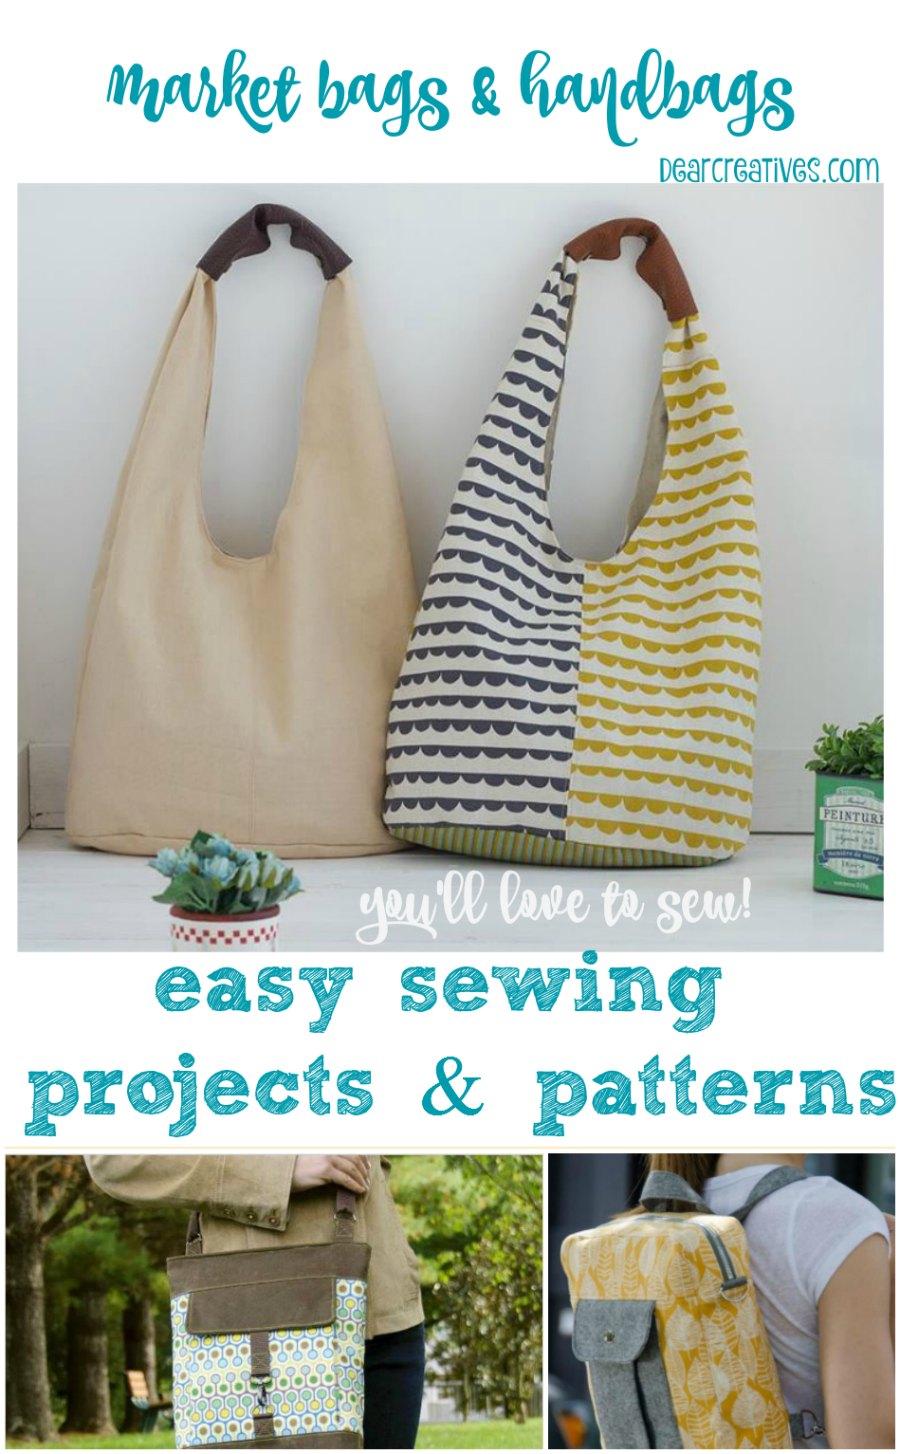 DIY Felt Craft Project Ideas | Felt Craft Projects | So many easy DIY felt craft - Sewing Patterns Market bags and handbags